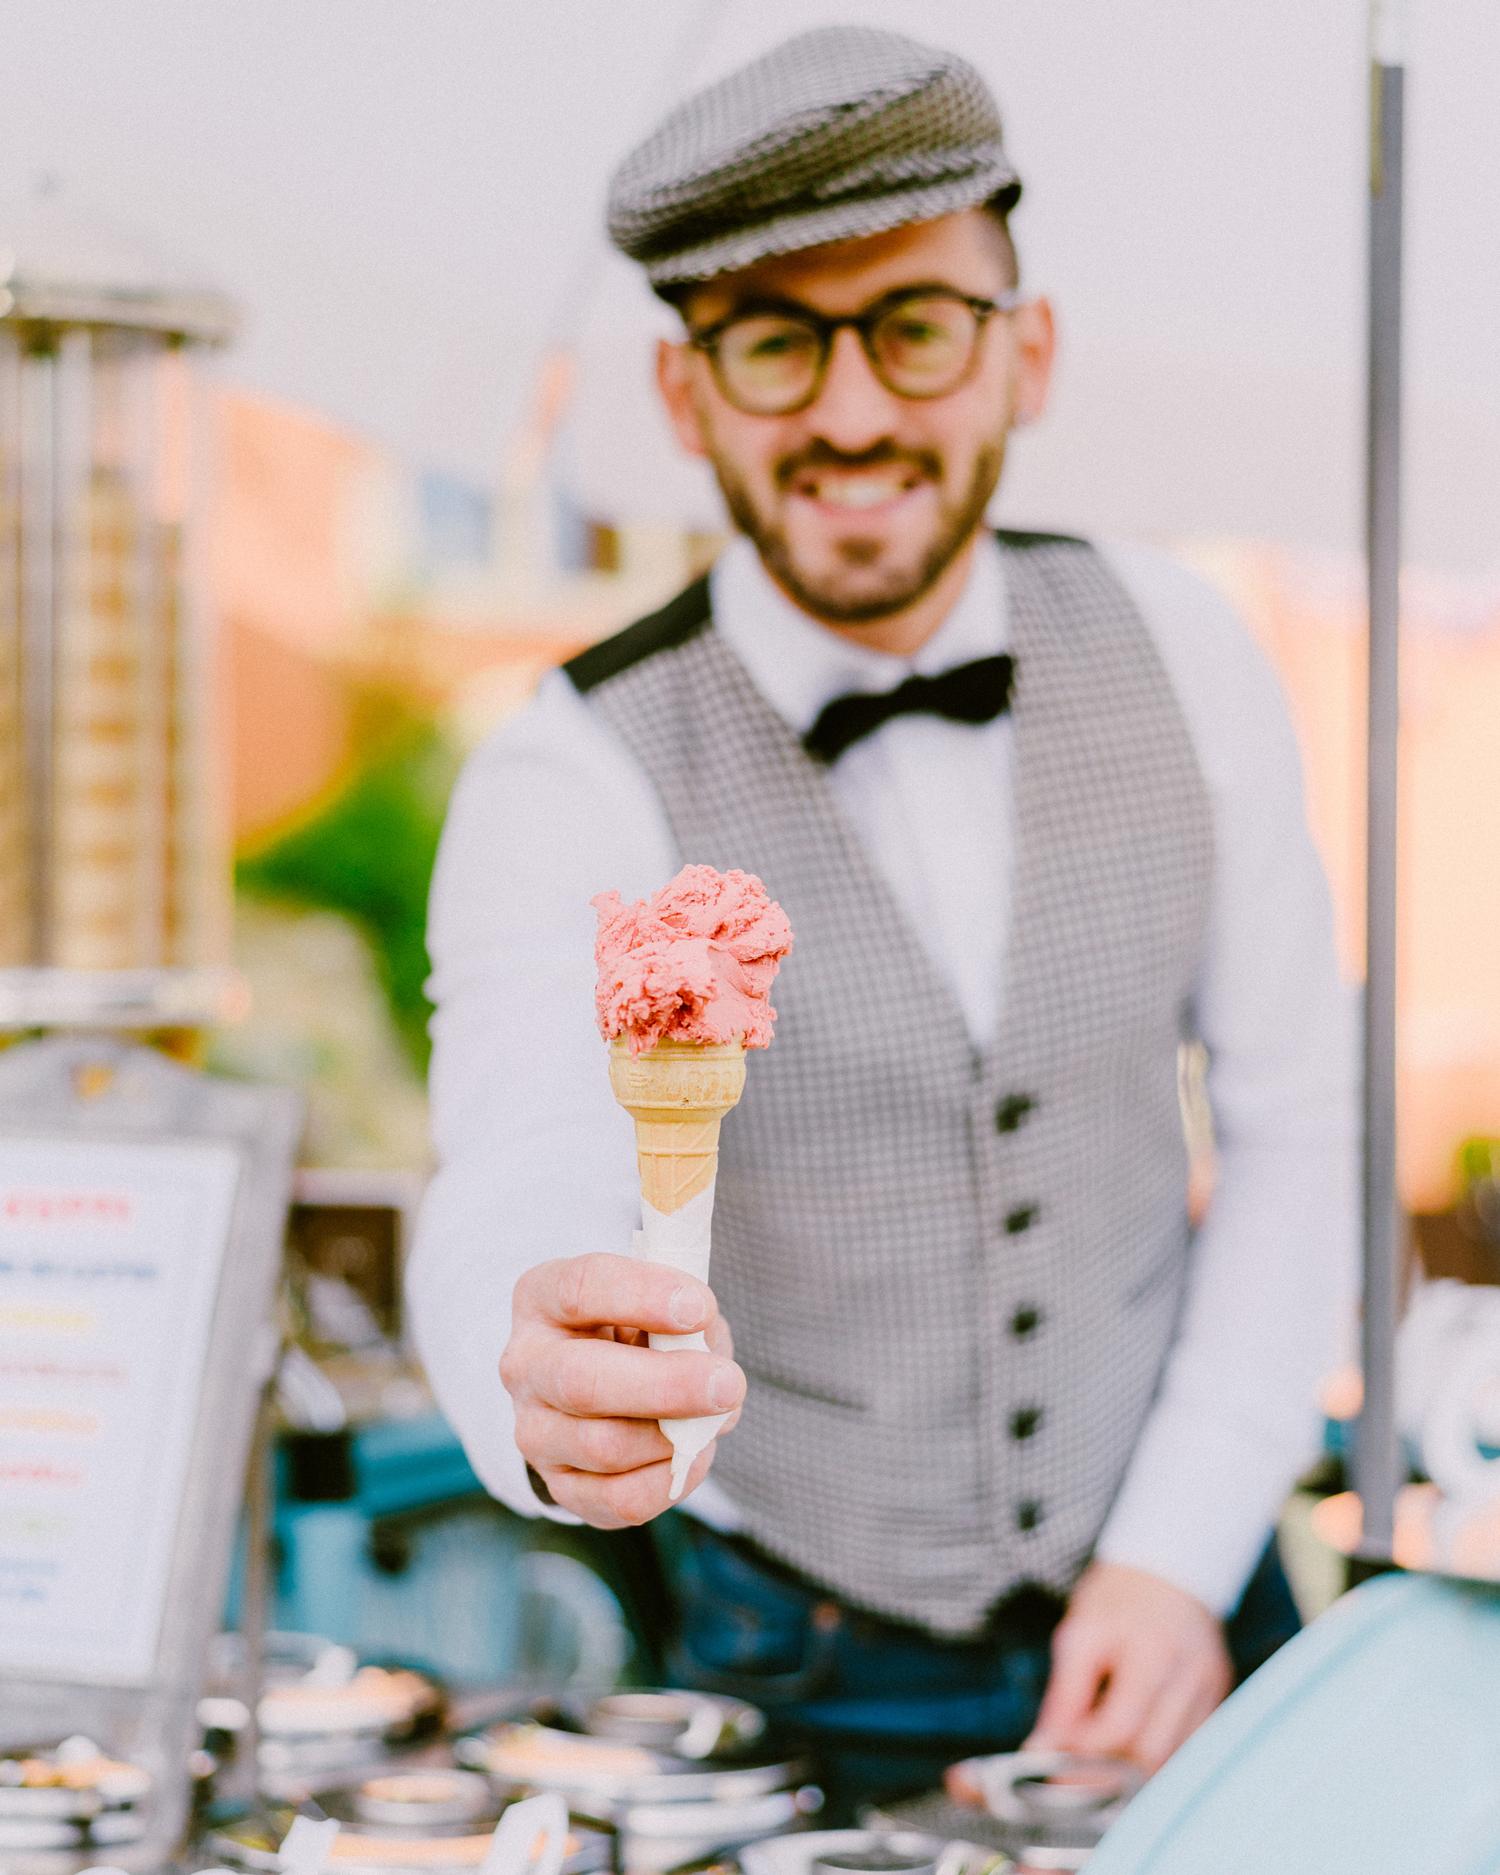 man serving pink ice cream cone